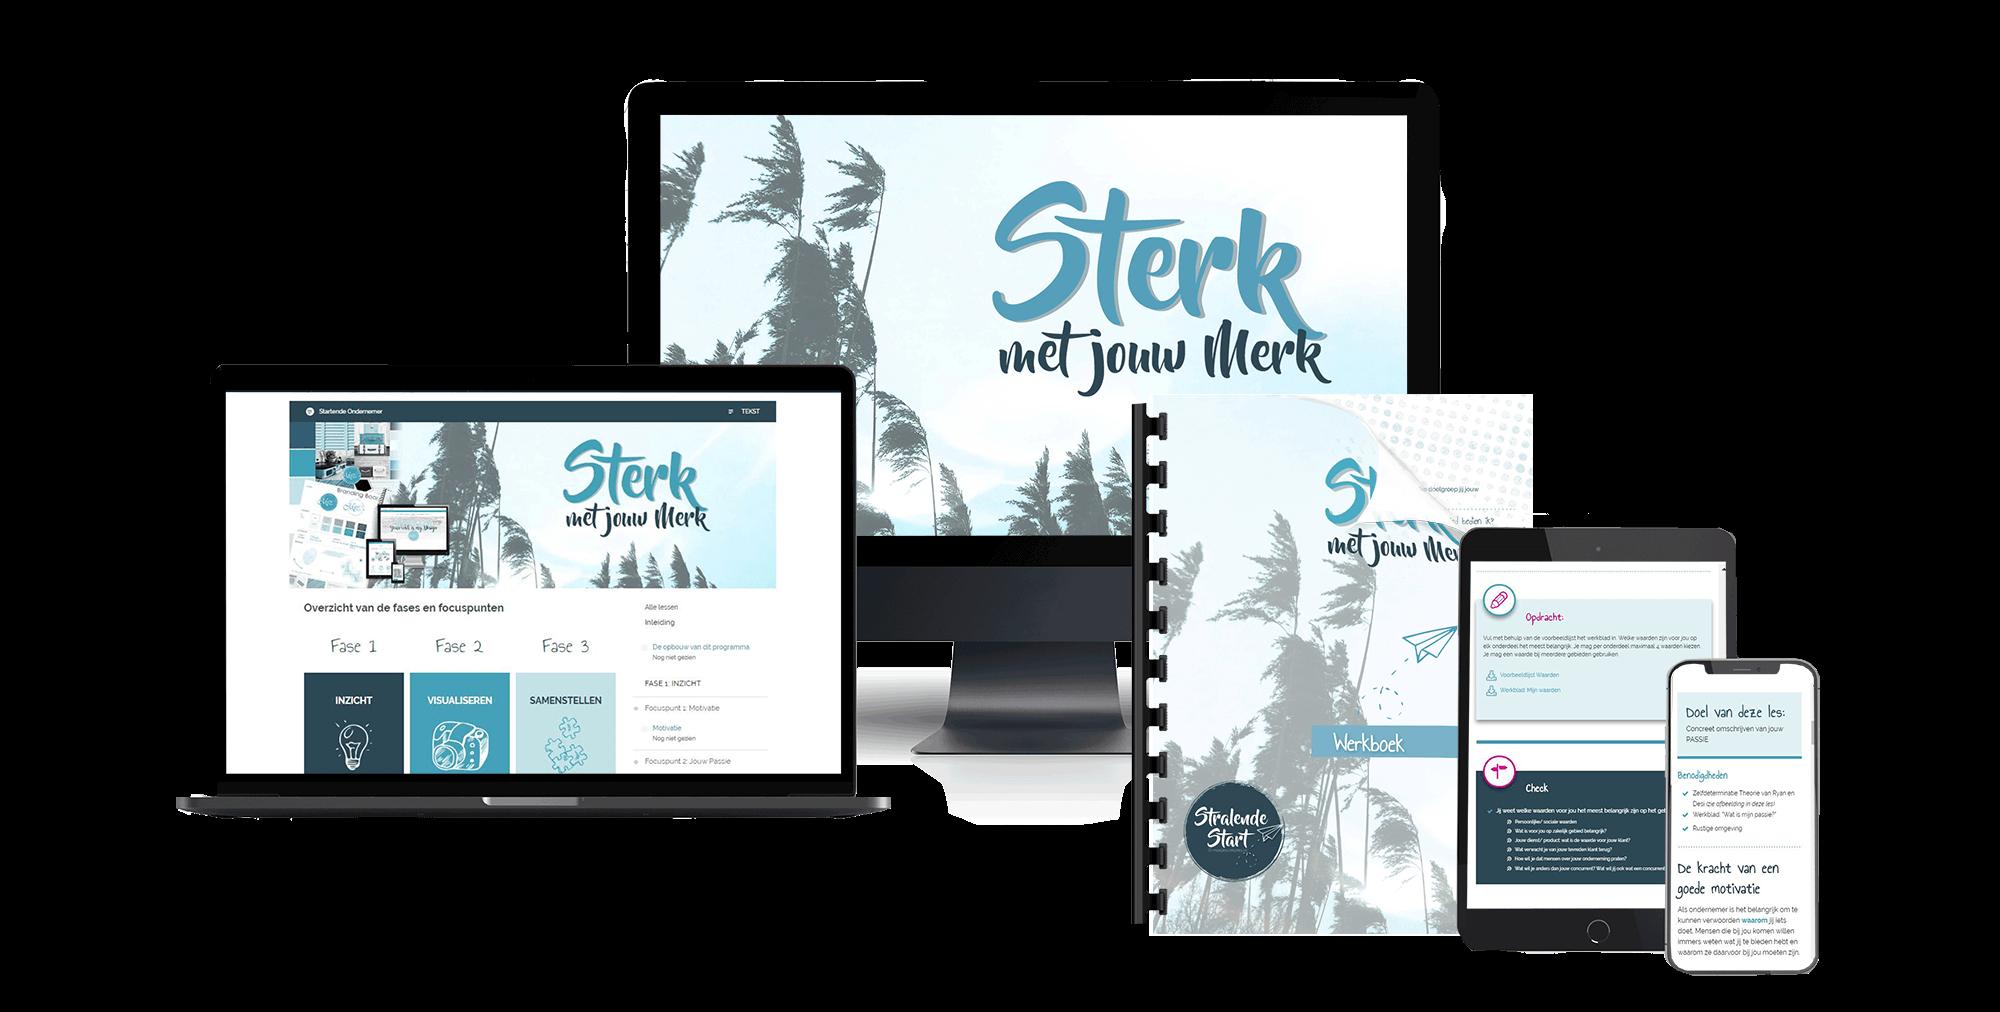 Sterk met jouw Merk - online training